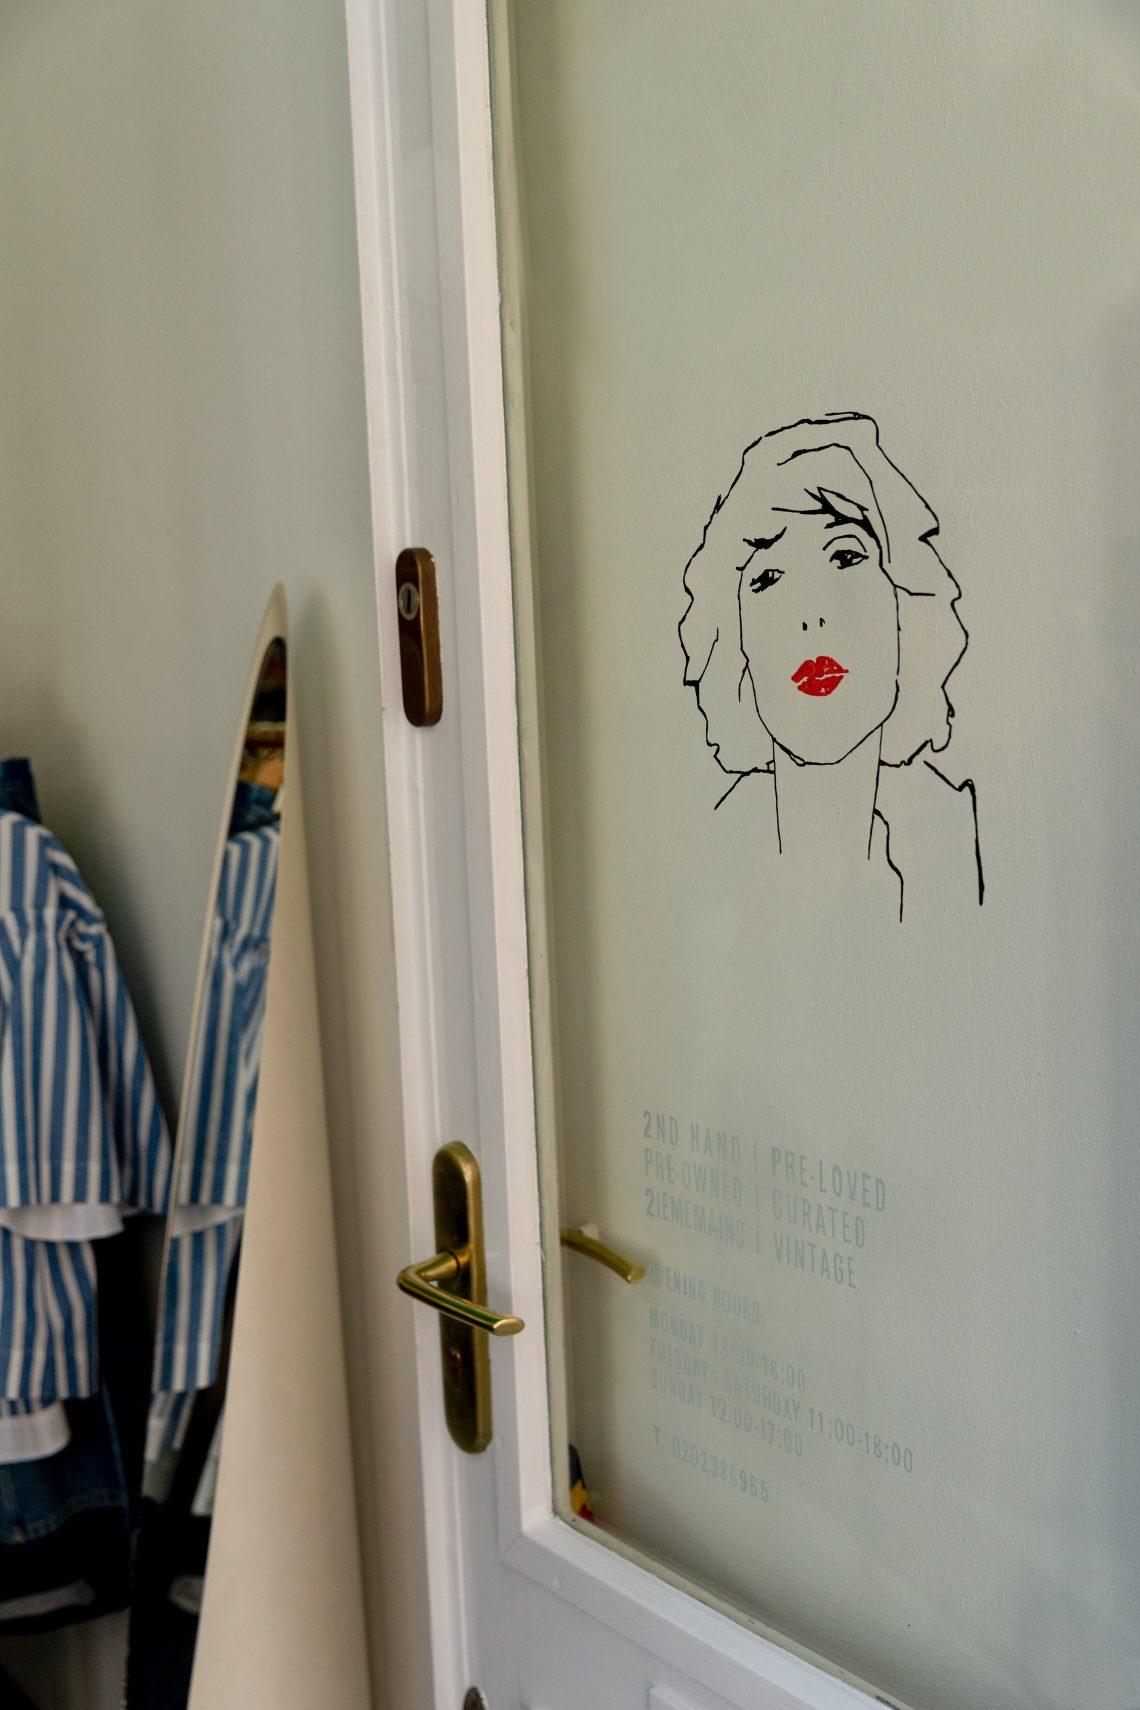 Tweedehands designer kleding van Salon Heleen Hulsmann